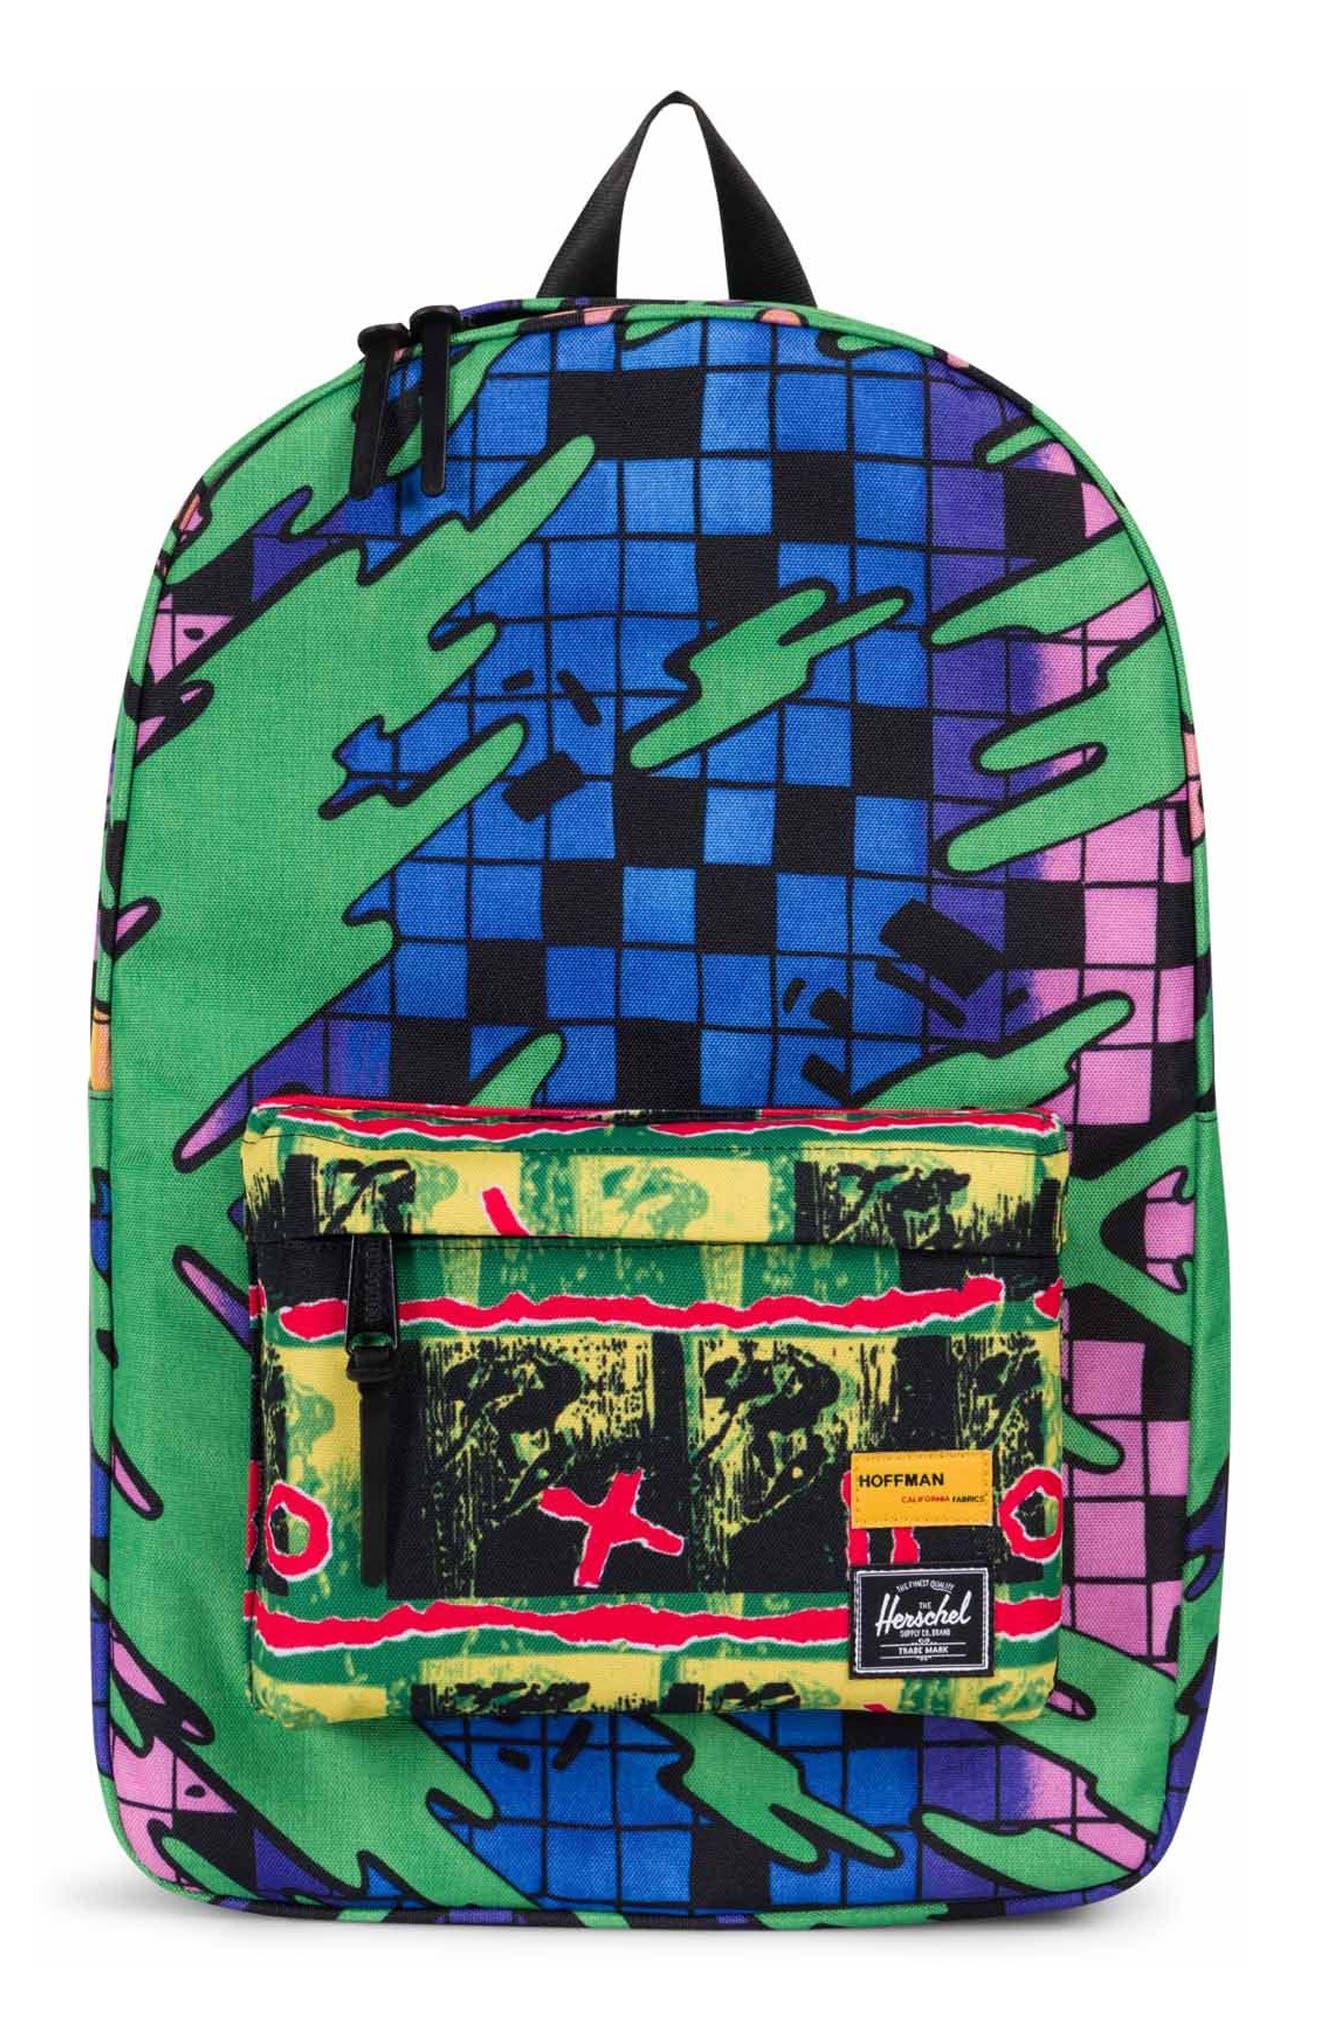 Hoffman Winlaw Backpack,                         Main,                         color, Green